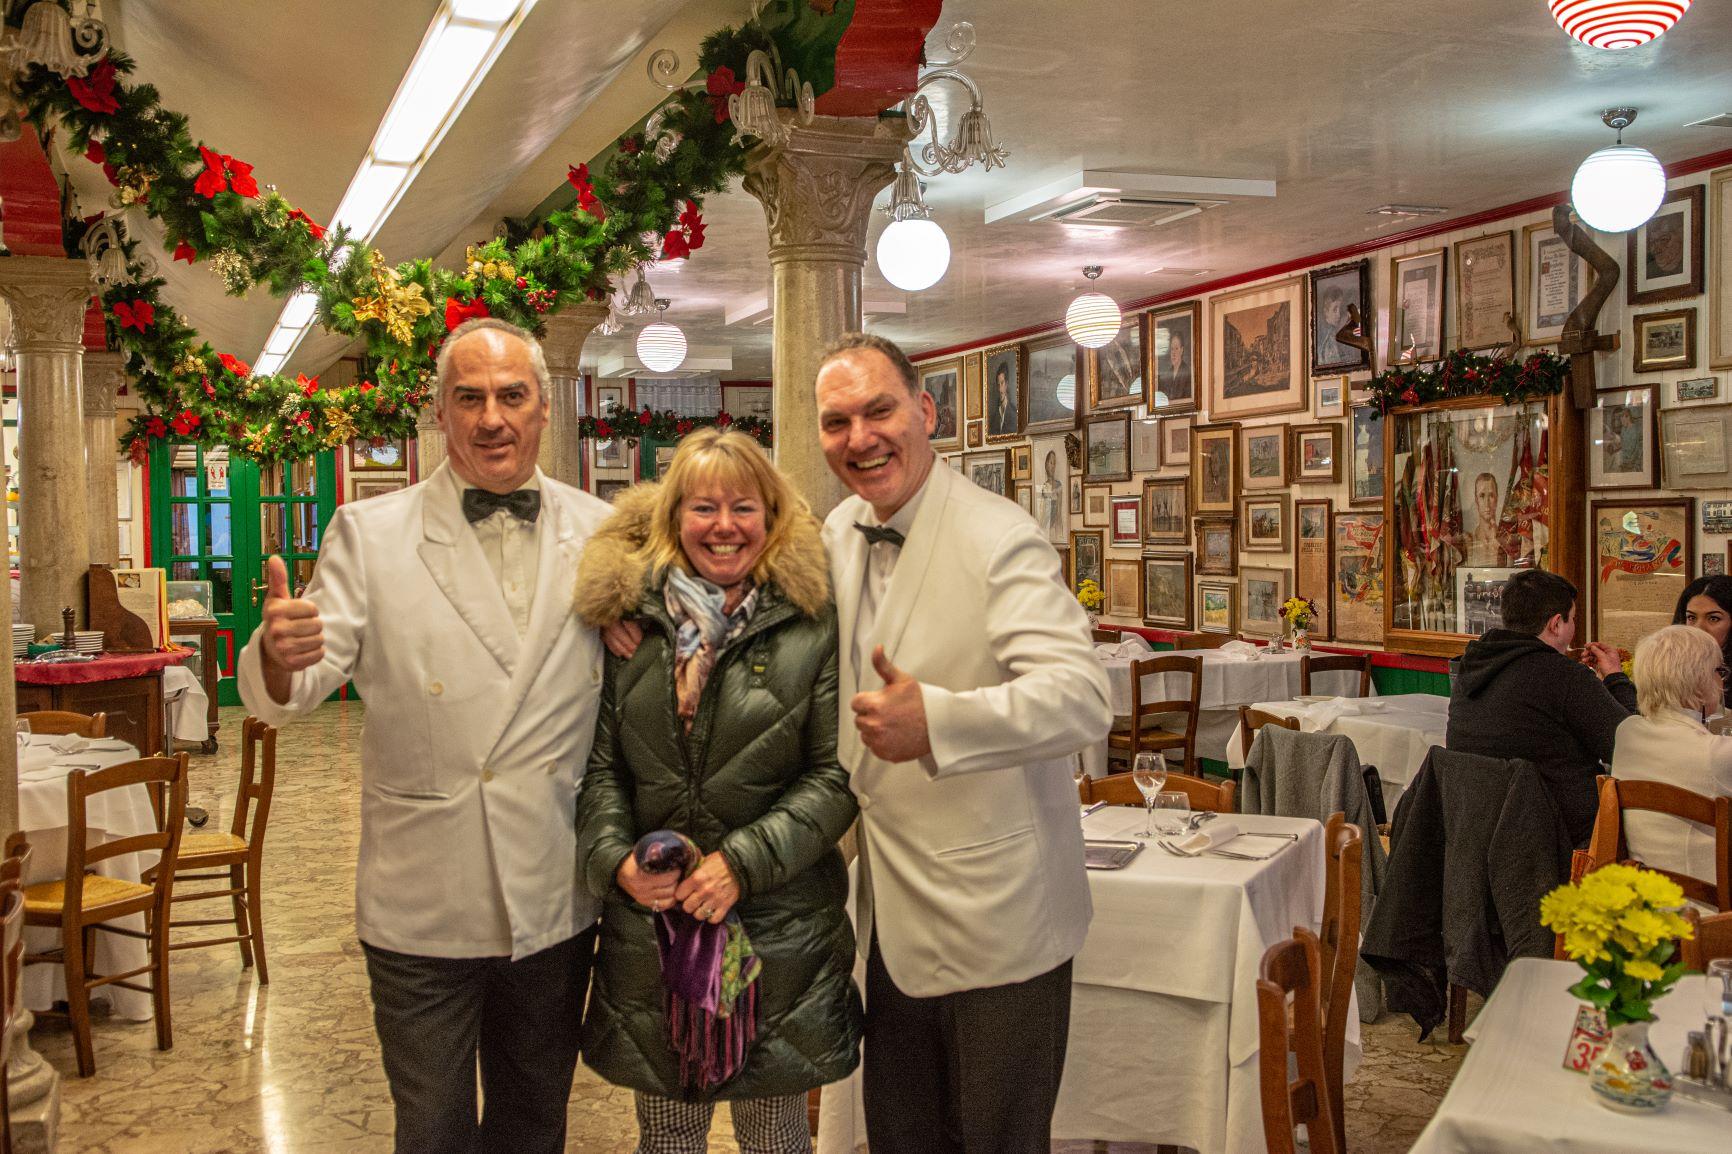 Dec 2019 - Da Romano Burano - Janet with waiters in my favourite restaurant in the lagoon, Da Romano - photo by Mark Caplan.